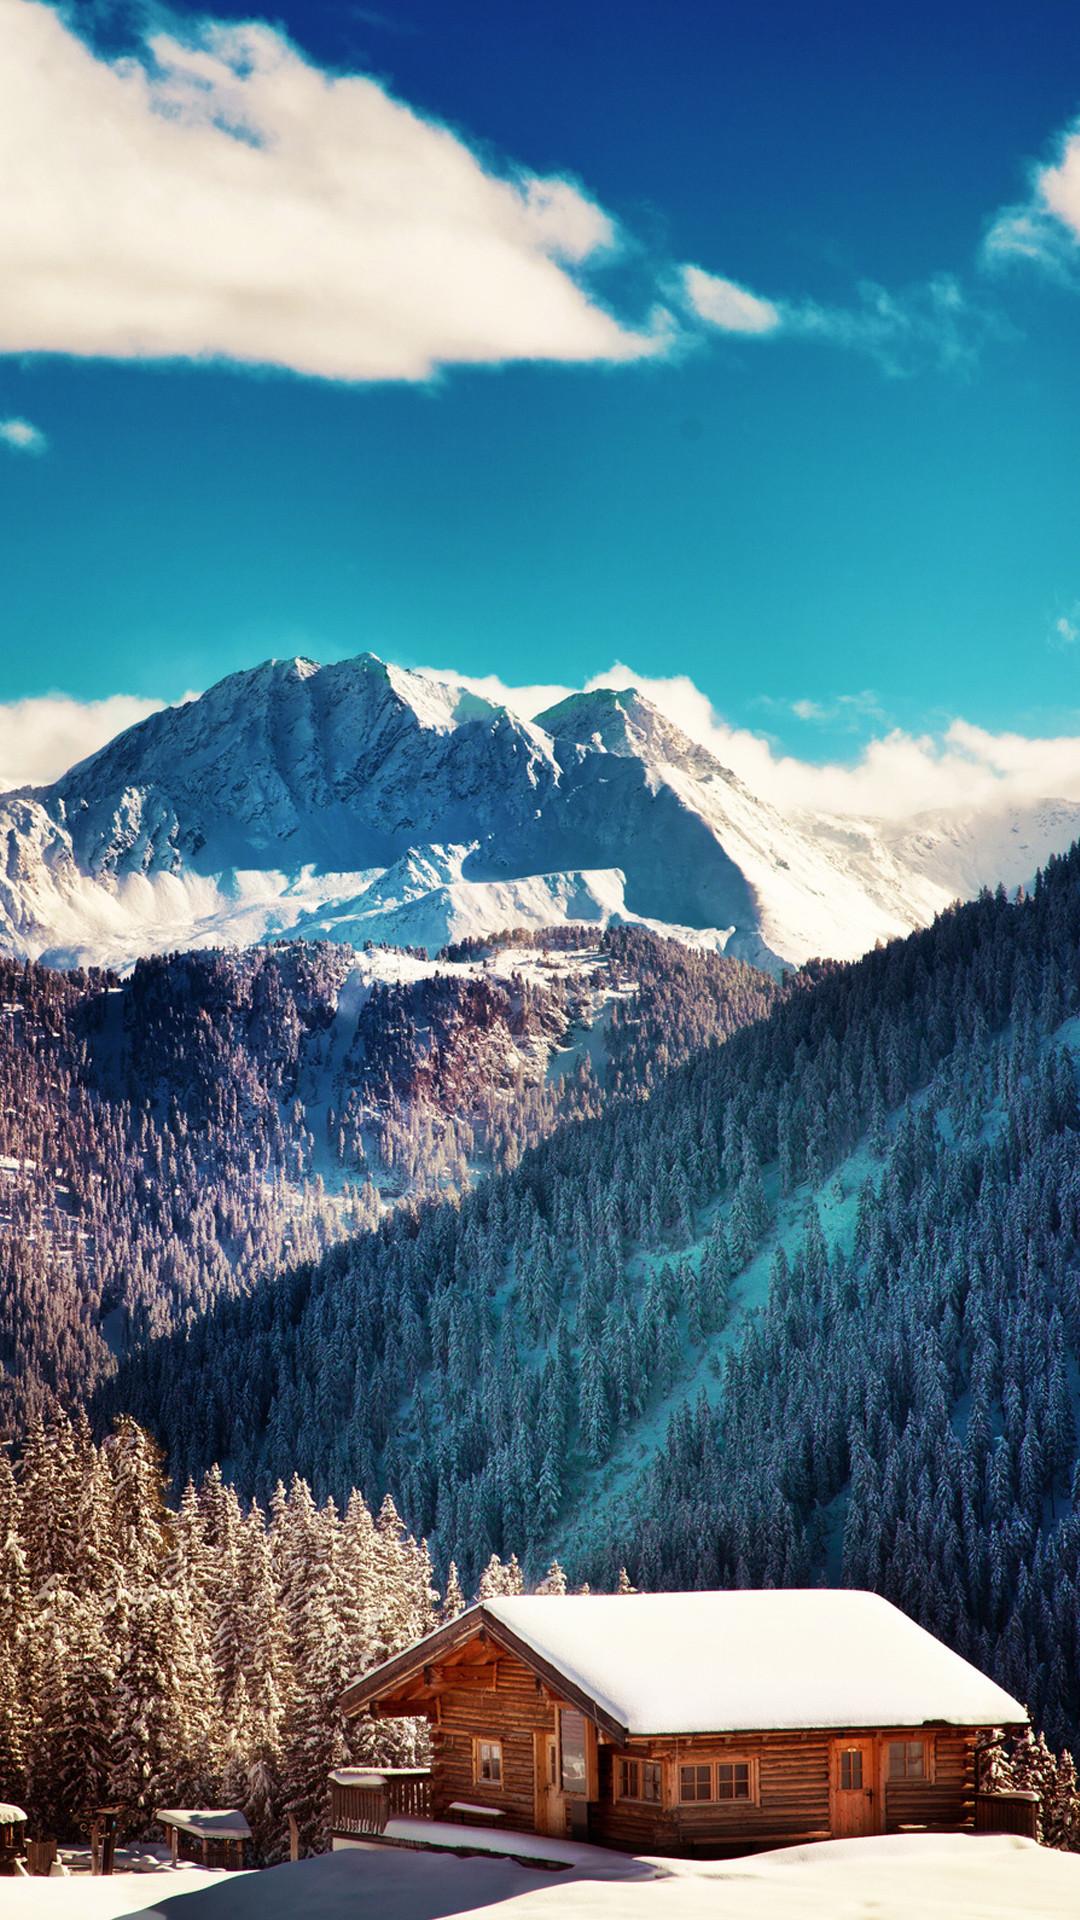 Mountains Chalet Winter Landscape iPhone 7 Plus HD Wallpaper